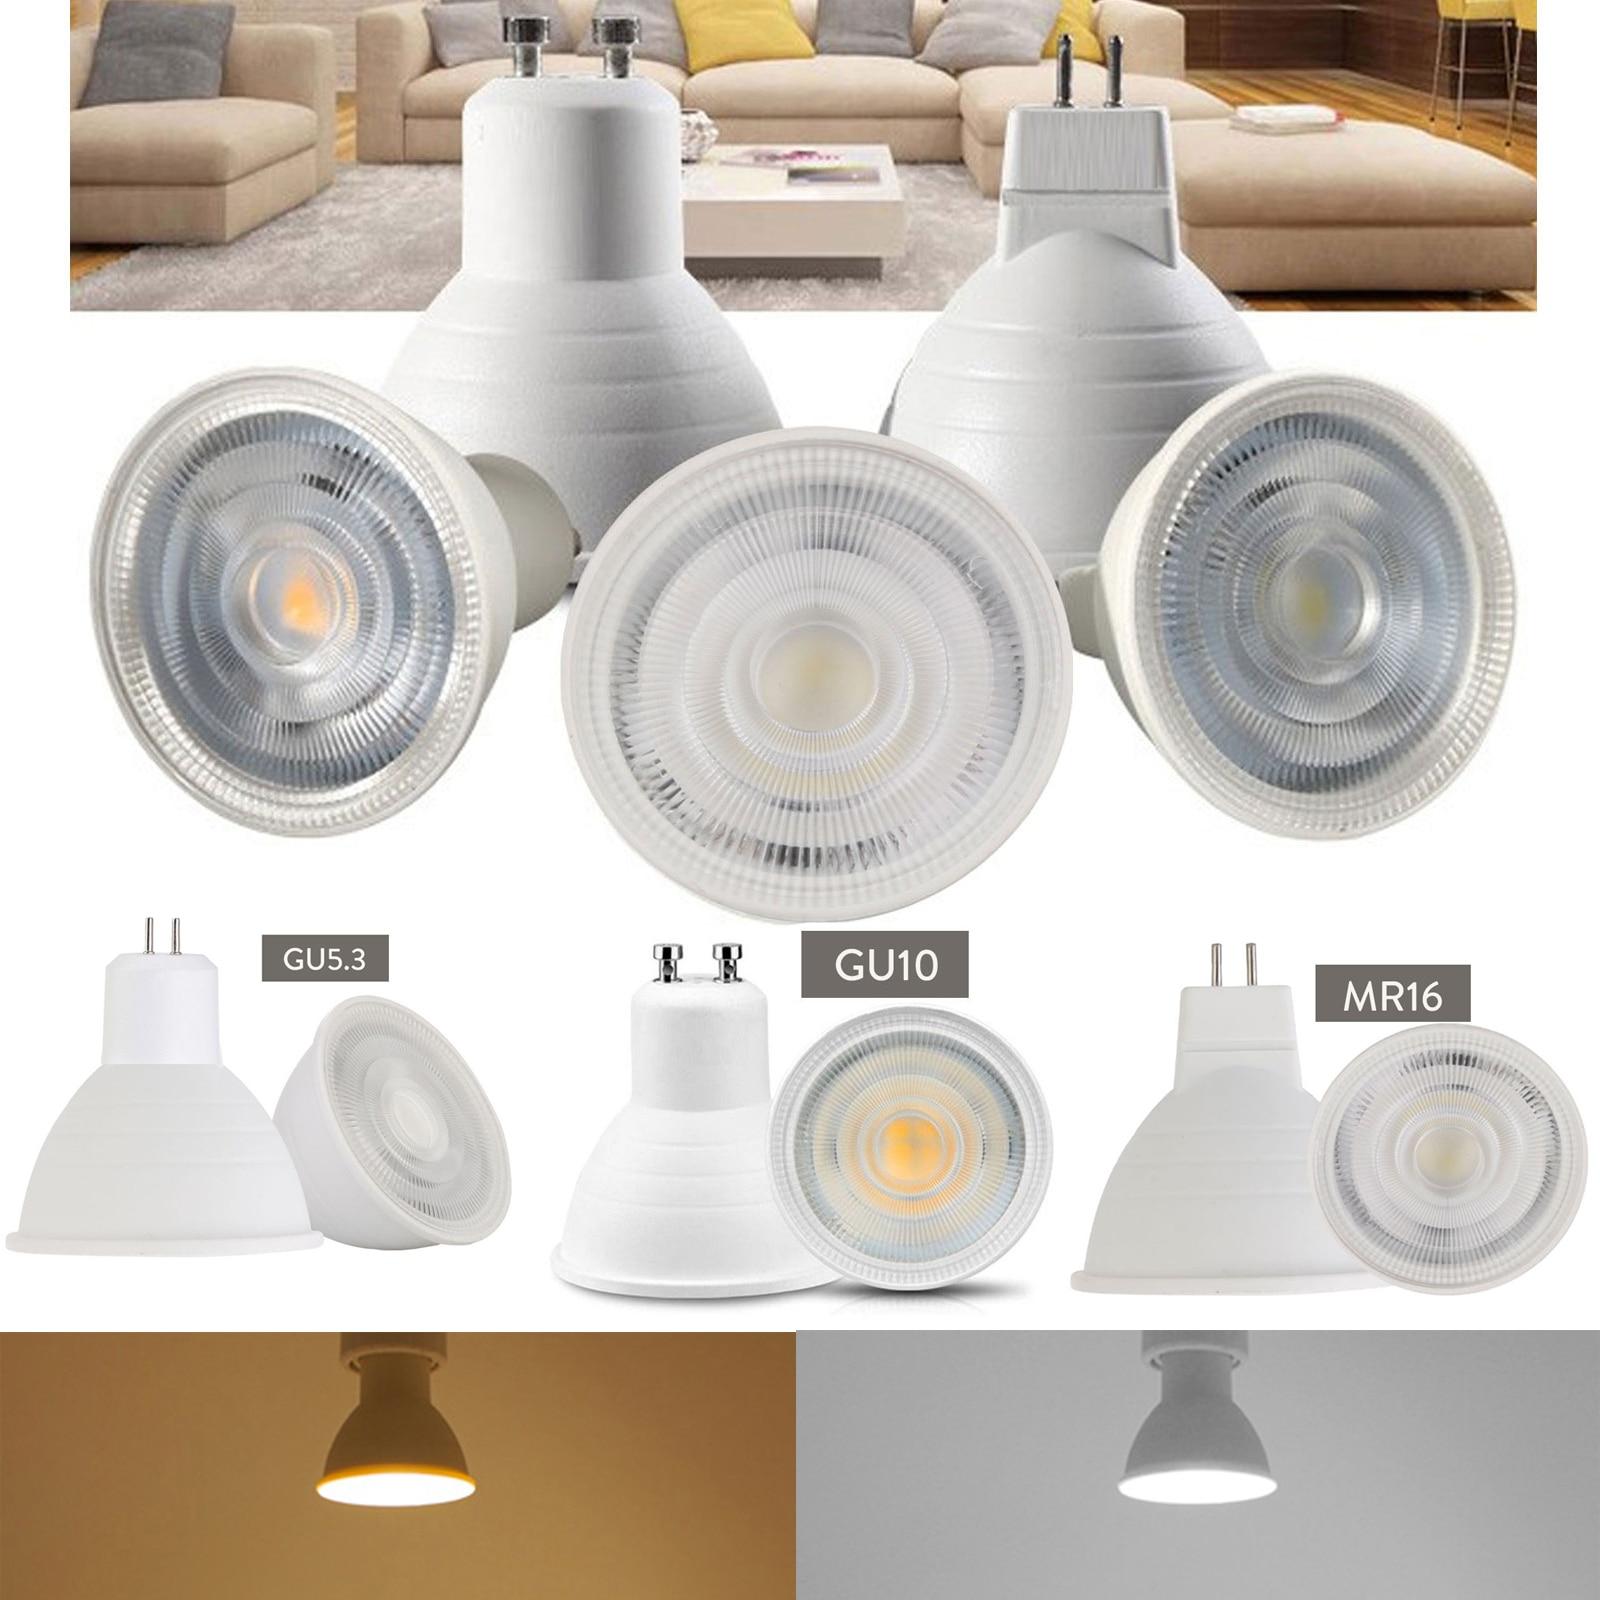 Dimmable GU10 MR16 GU5.3 LED Spotlight 7W AC 220V 110V COB Light Bulbs 30° Beam Angle For Downlight Table Lamp Cool Warm White